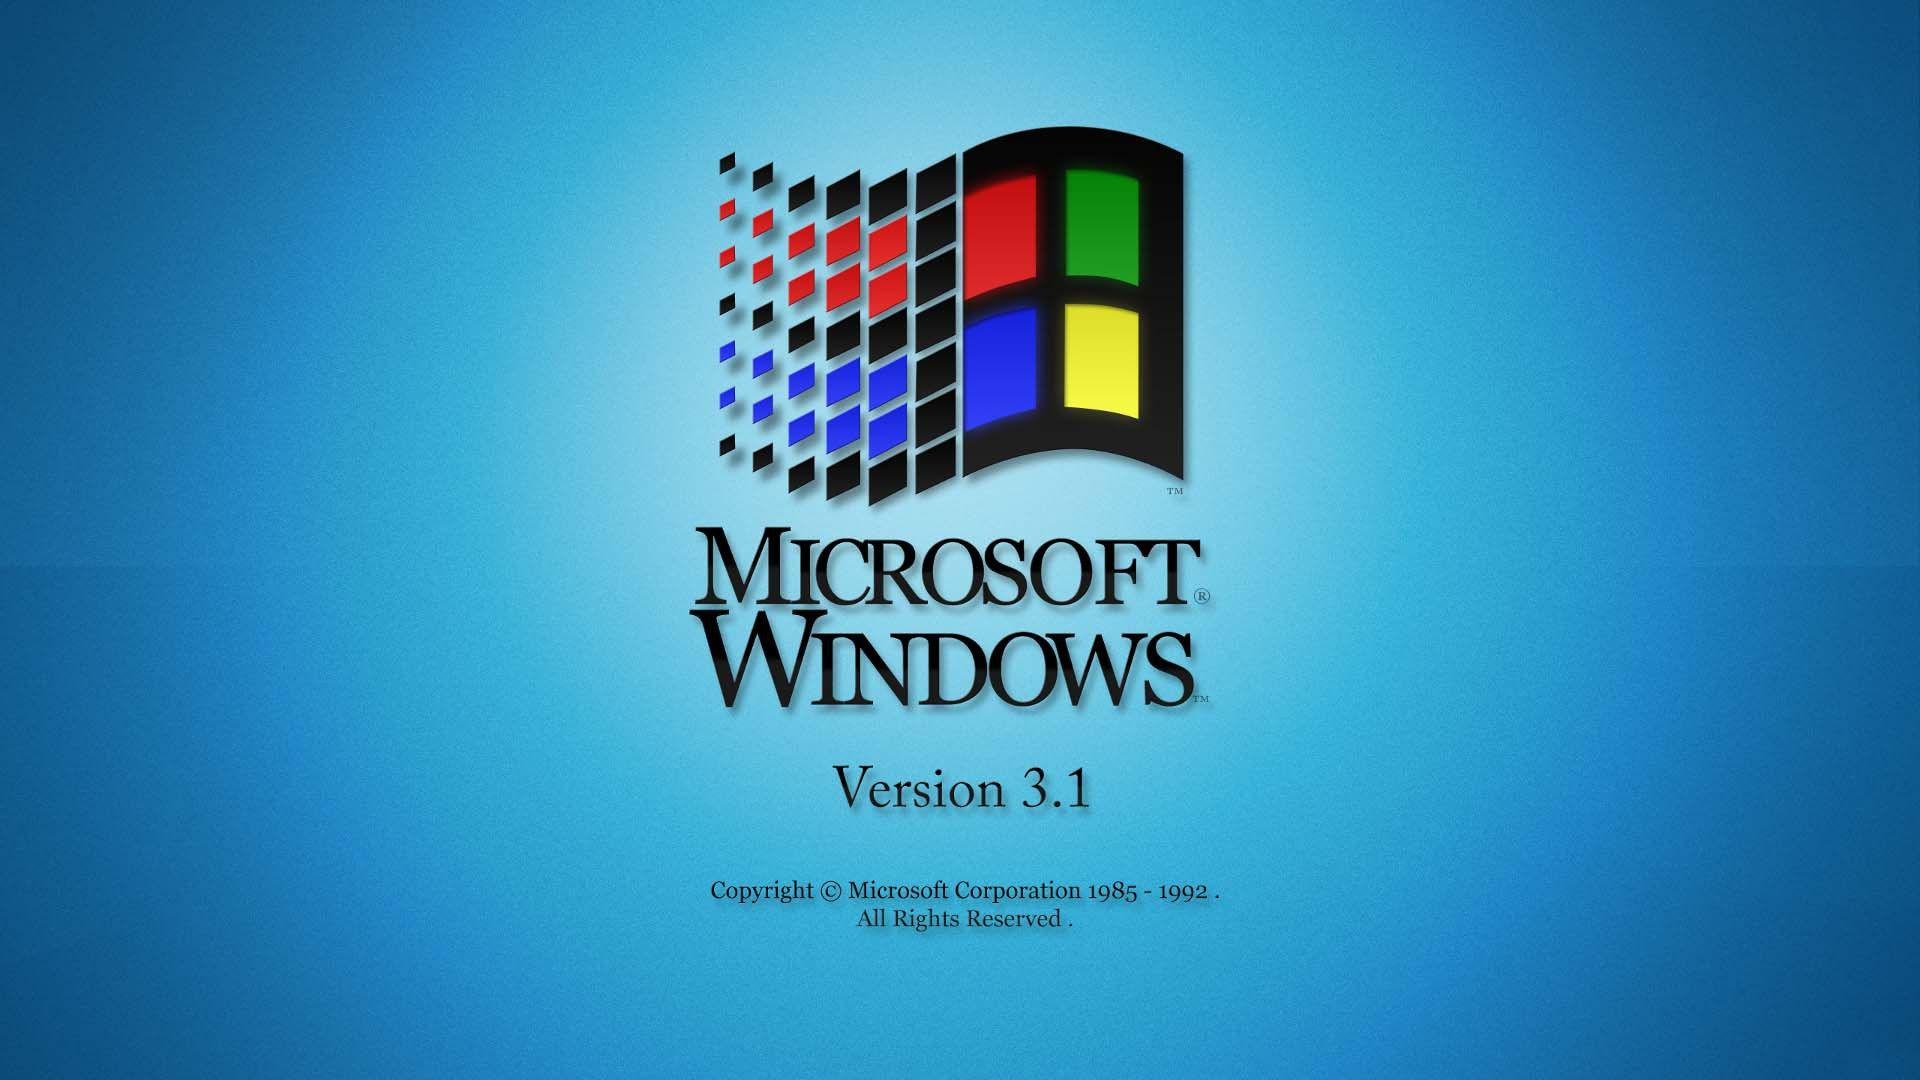 Windows 95 Wallpaper Hd Pertaining To Windows 95 Wallpaper Hd